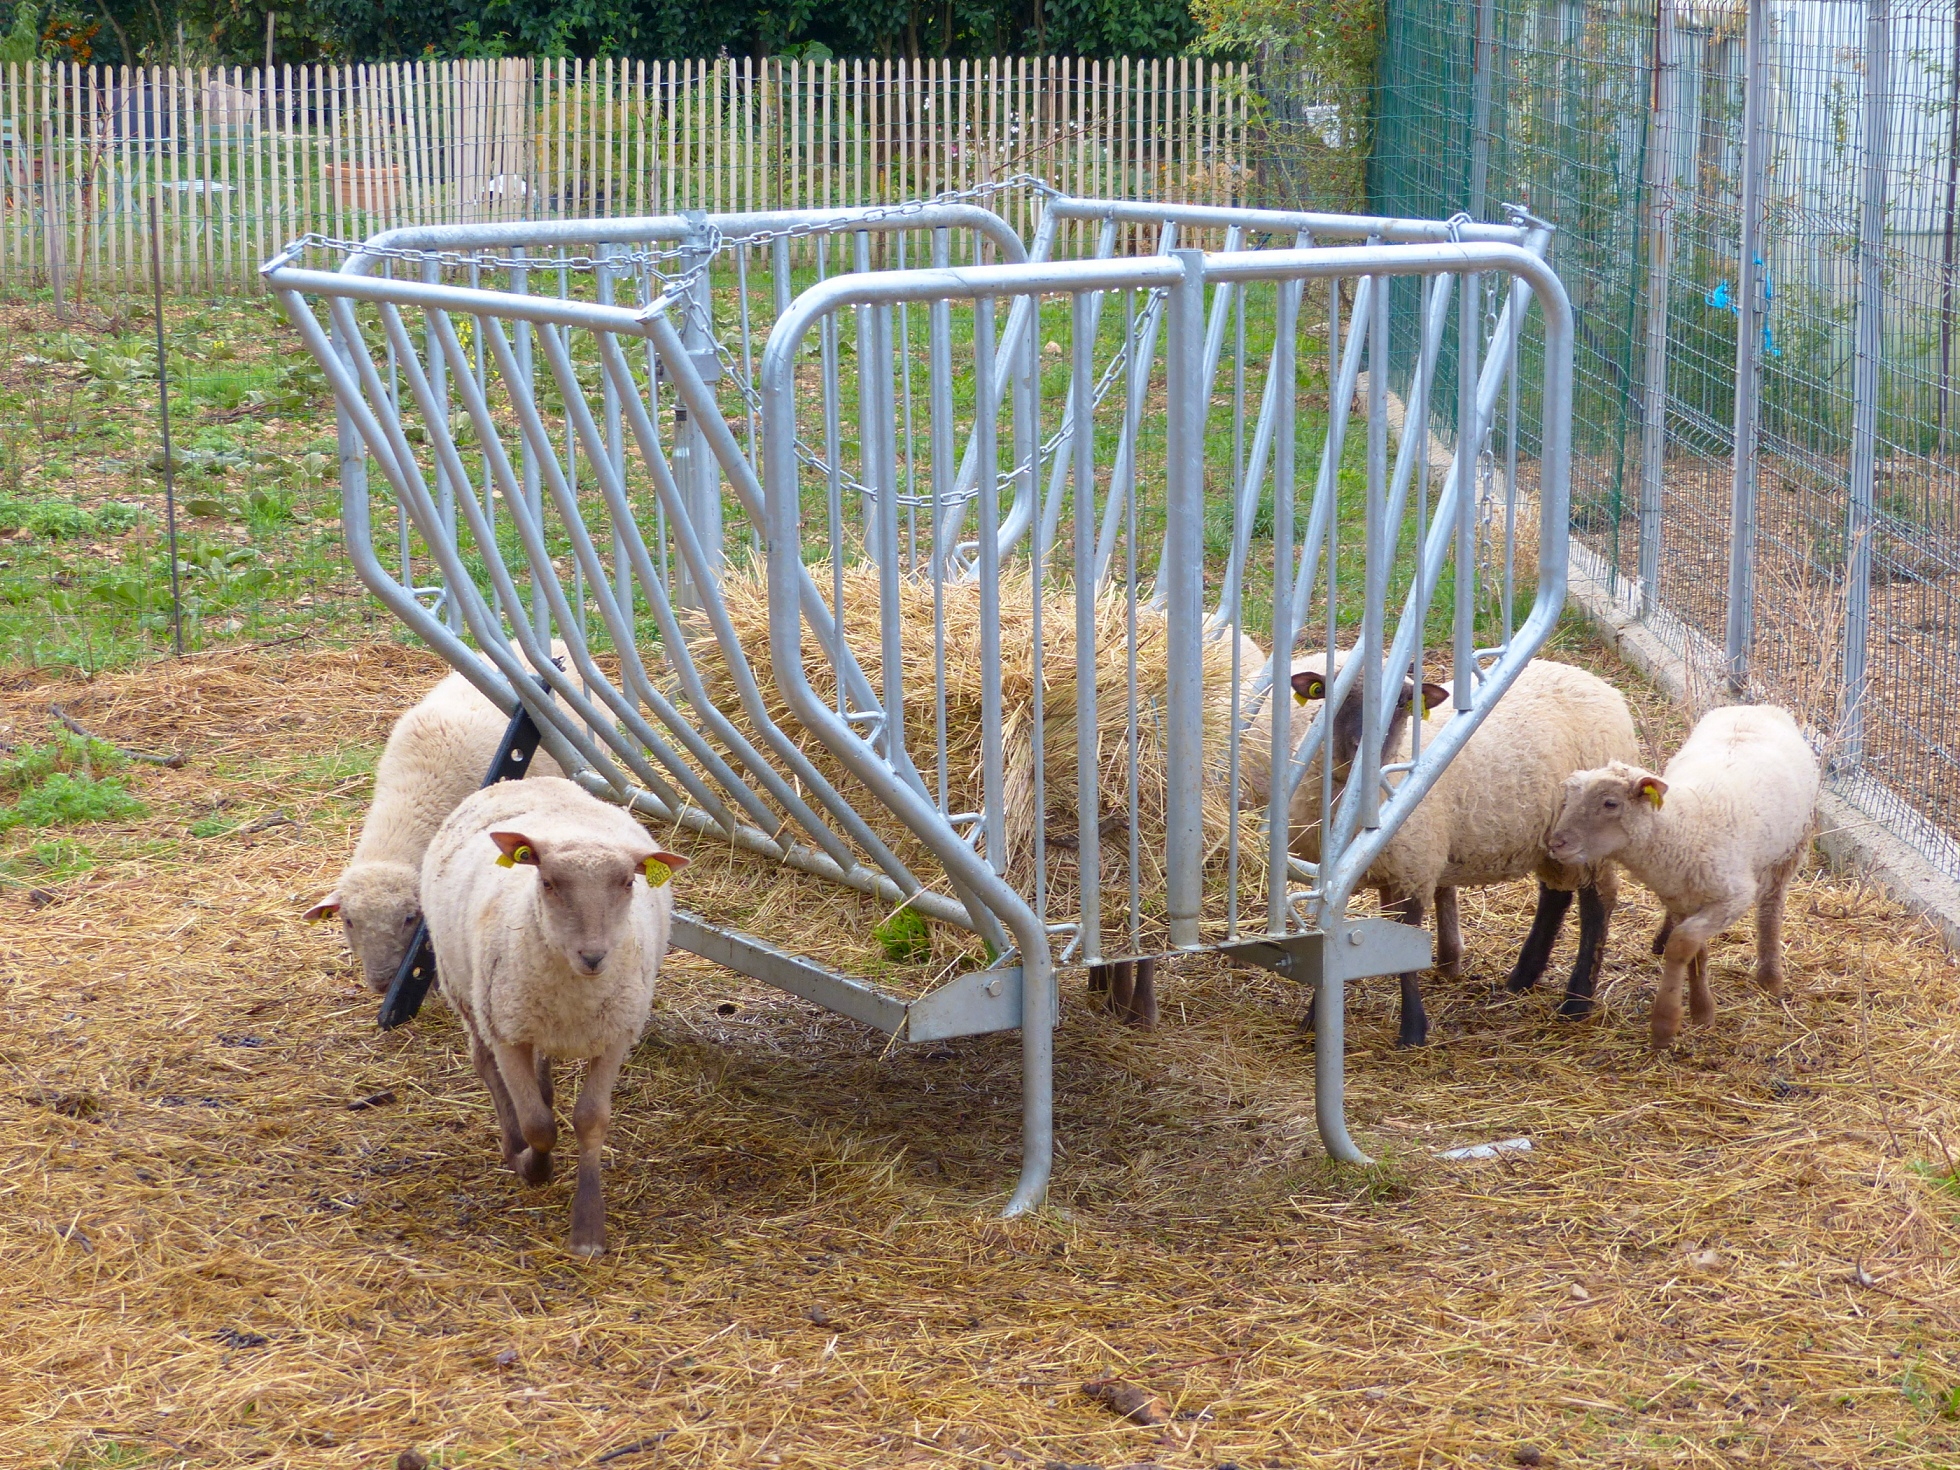 http://ekladata.com/LbrXGC4FsnivihttUBOFnJeZhFU/Saint-Jurs-2016-moutons.jpg